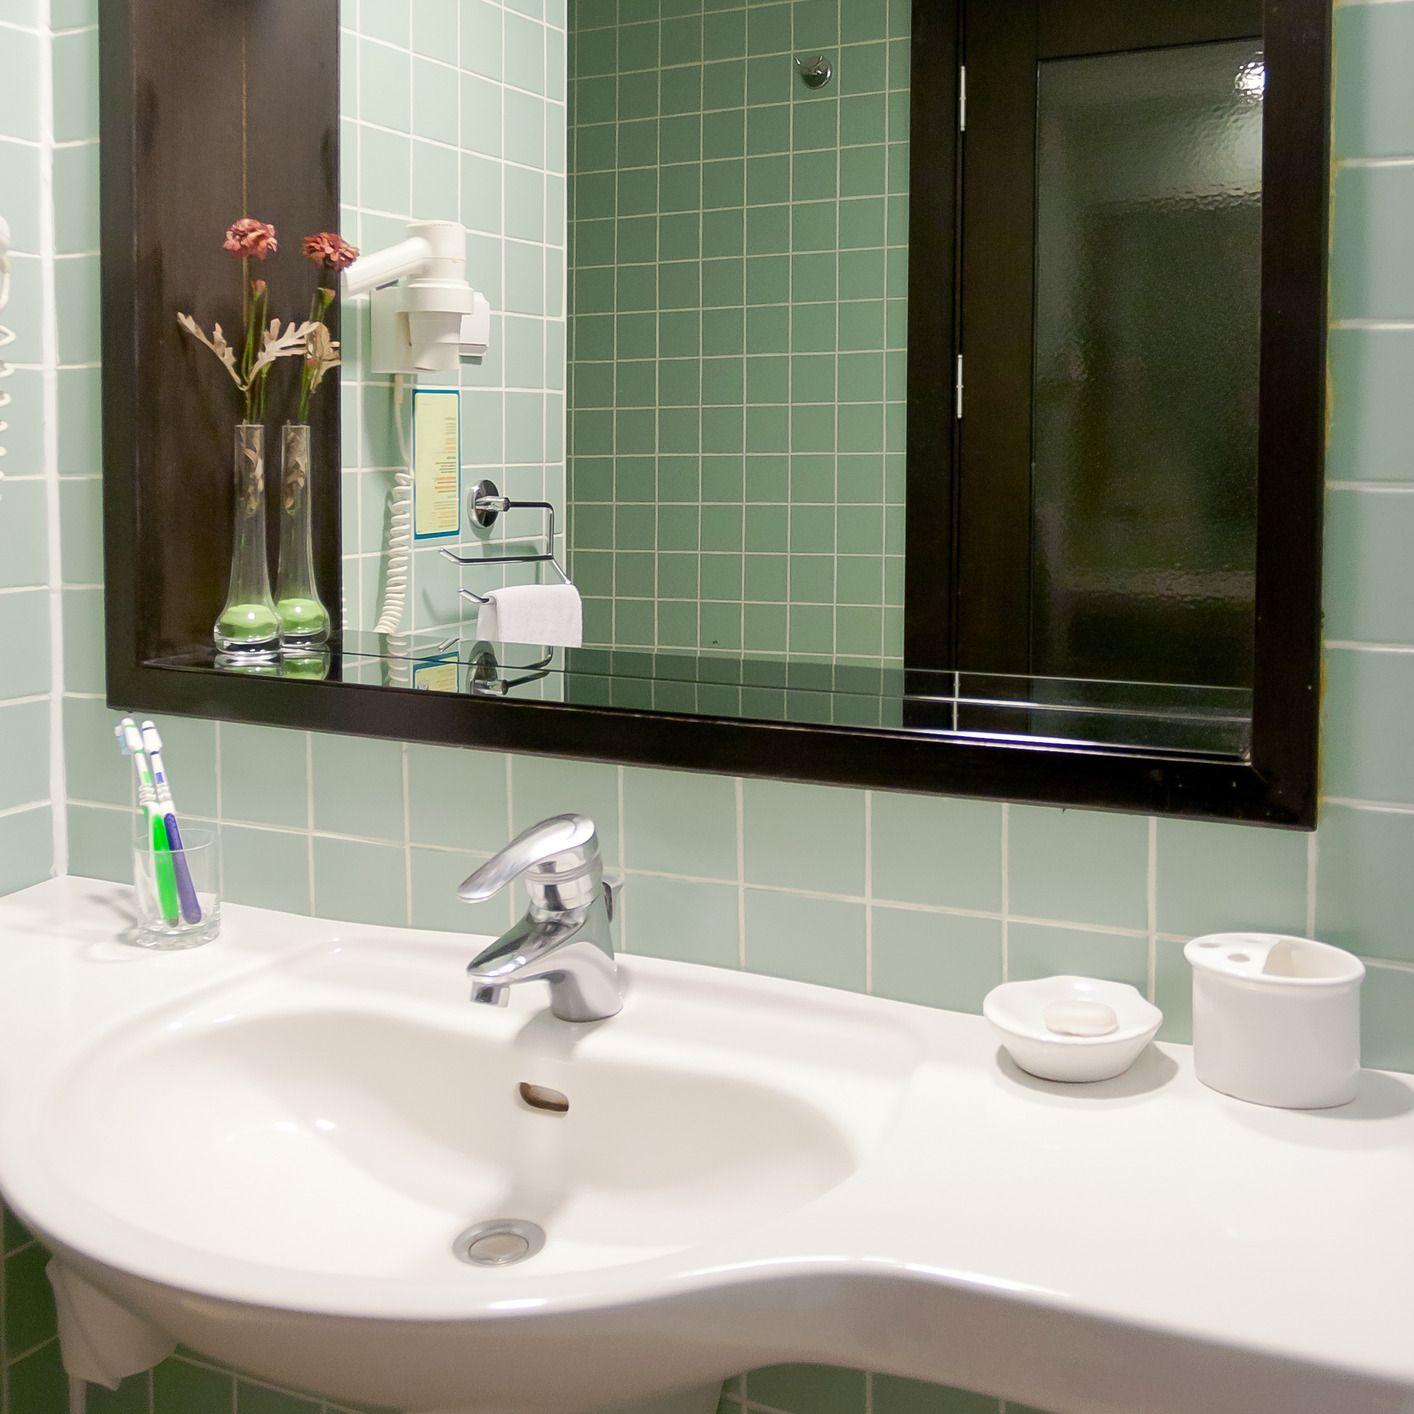 bathroom tile design software online | ideas 2017-2018 | Pinterest ...